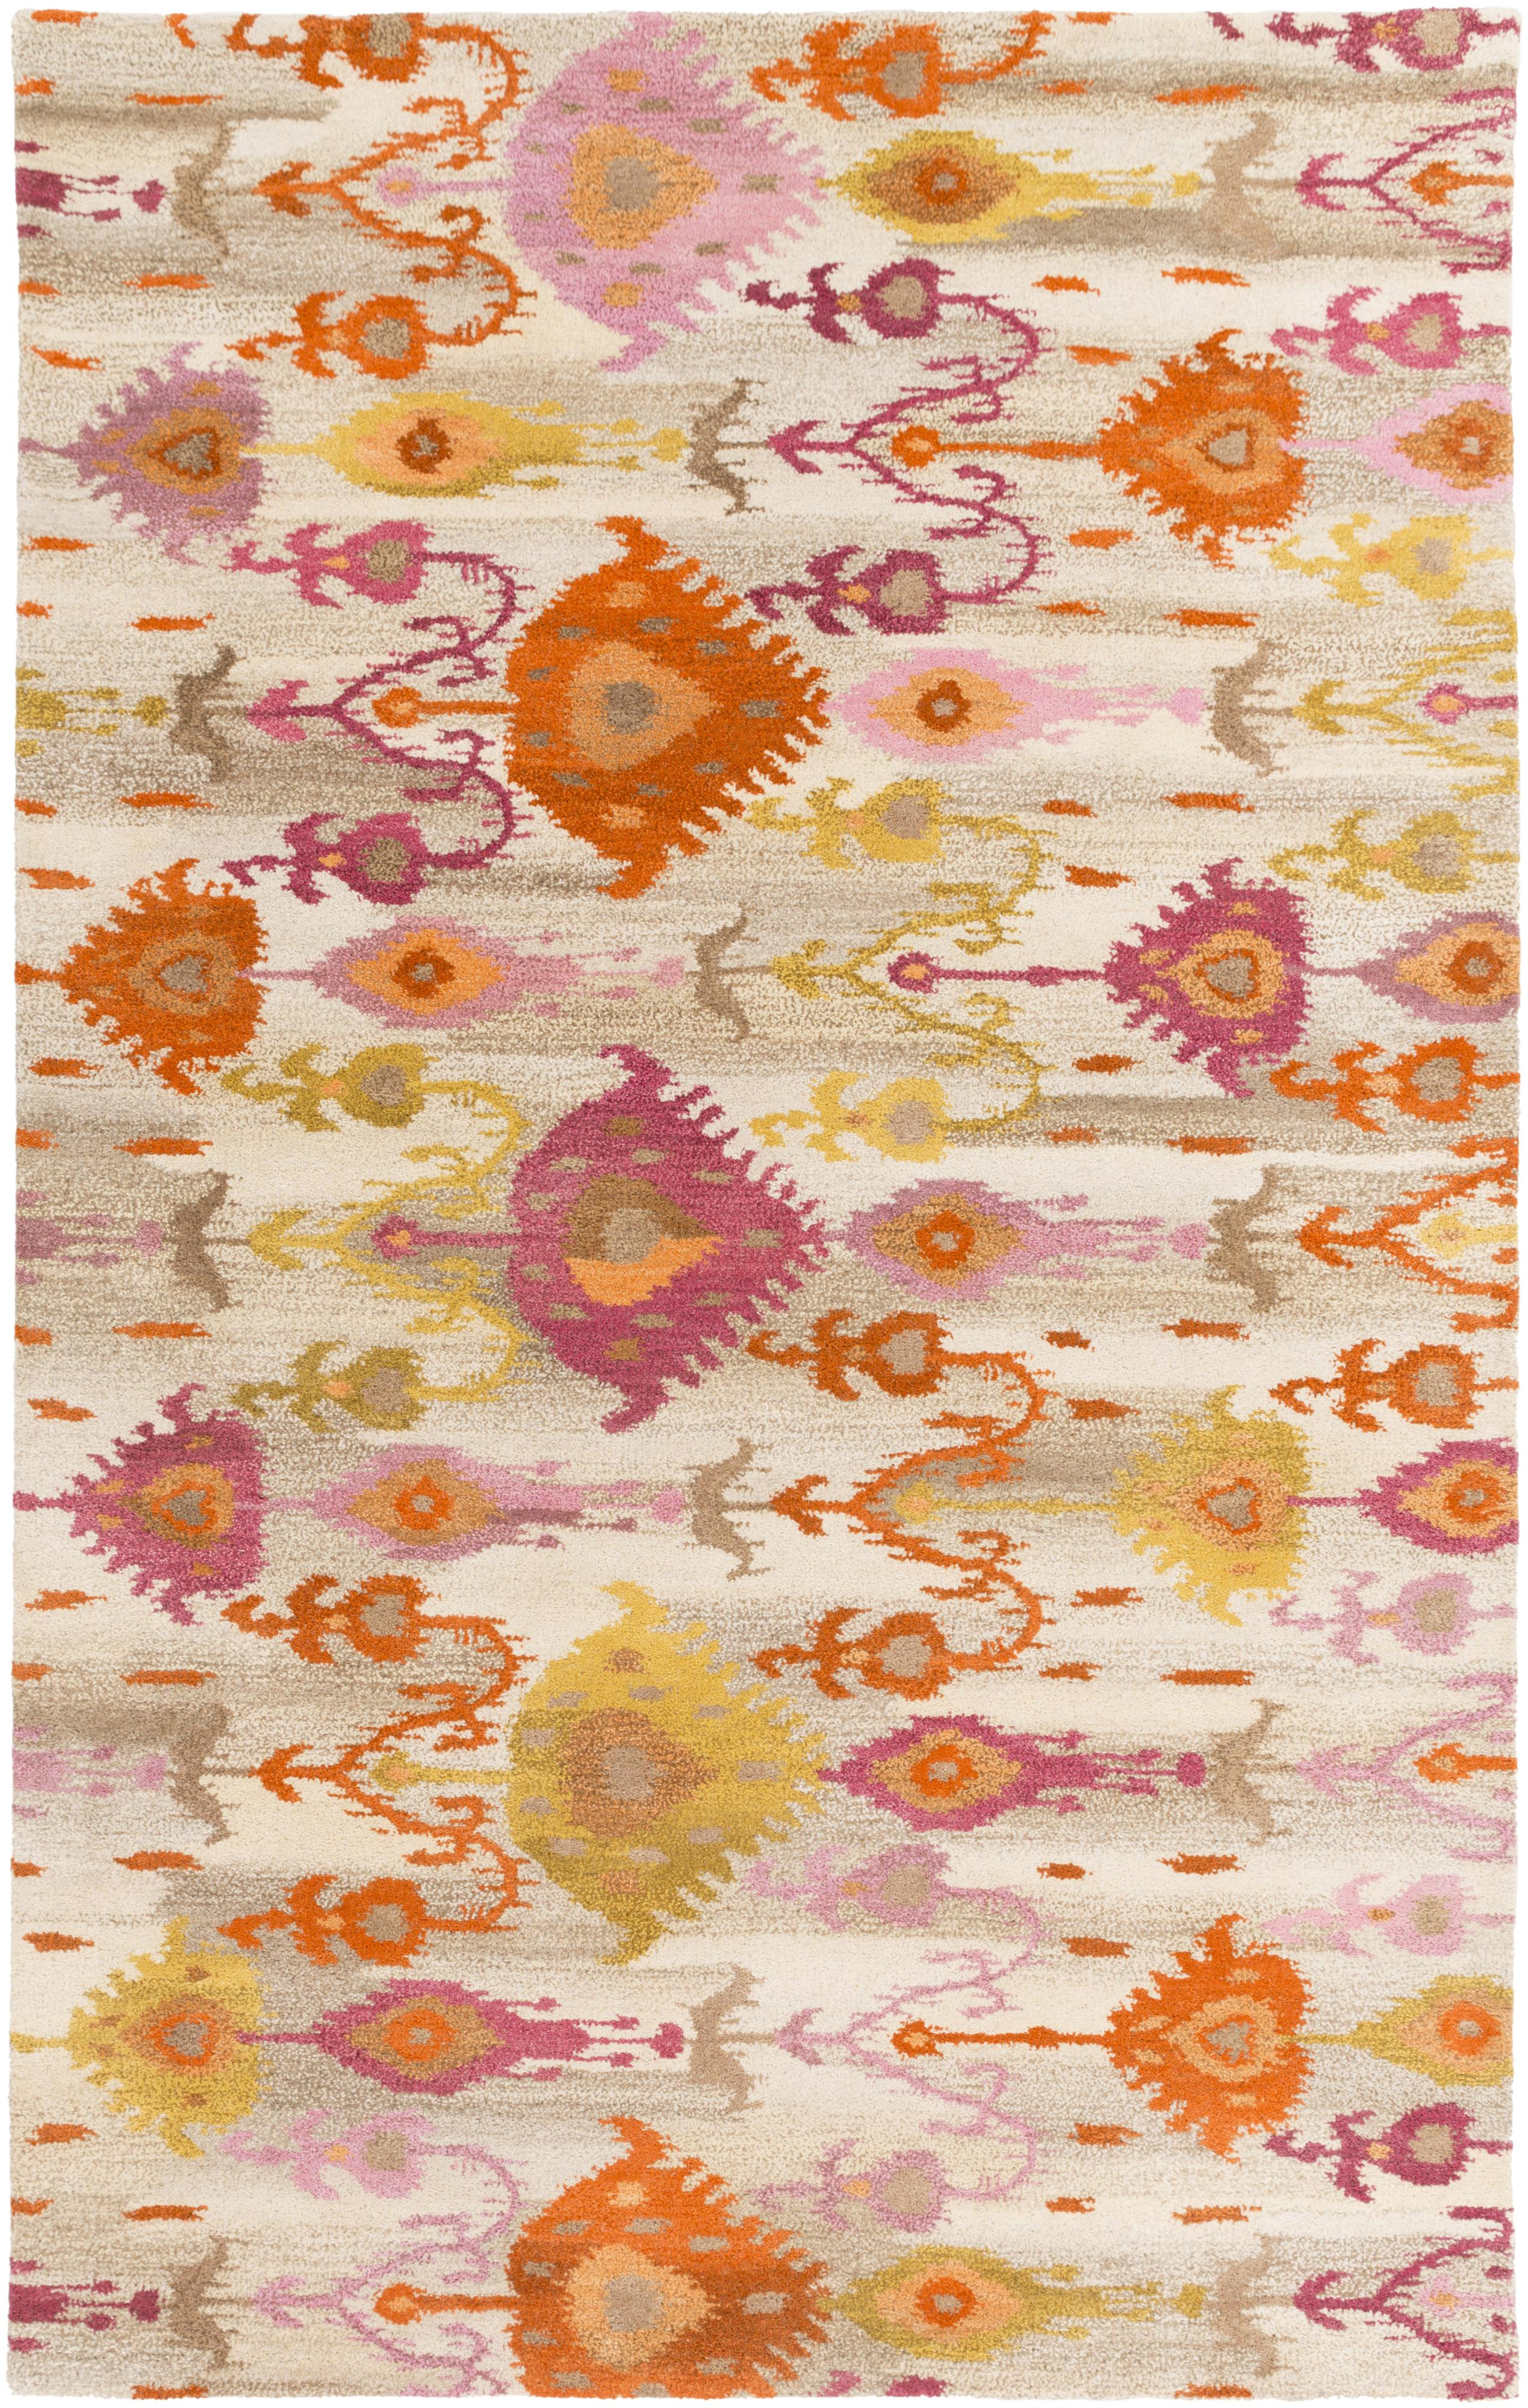 Surya Surroundings 5' x 8' - Item Number: SUR1016-58